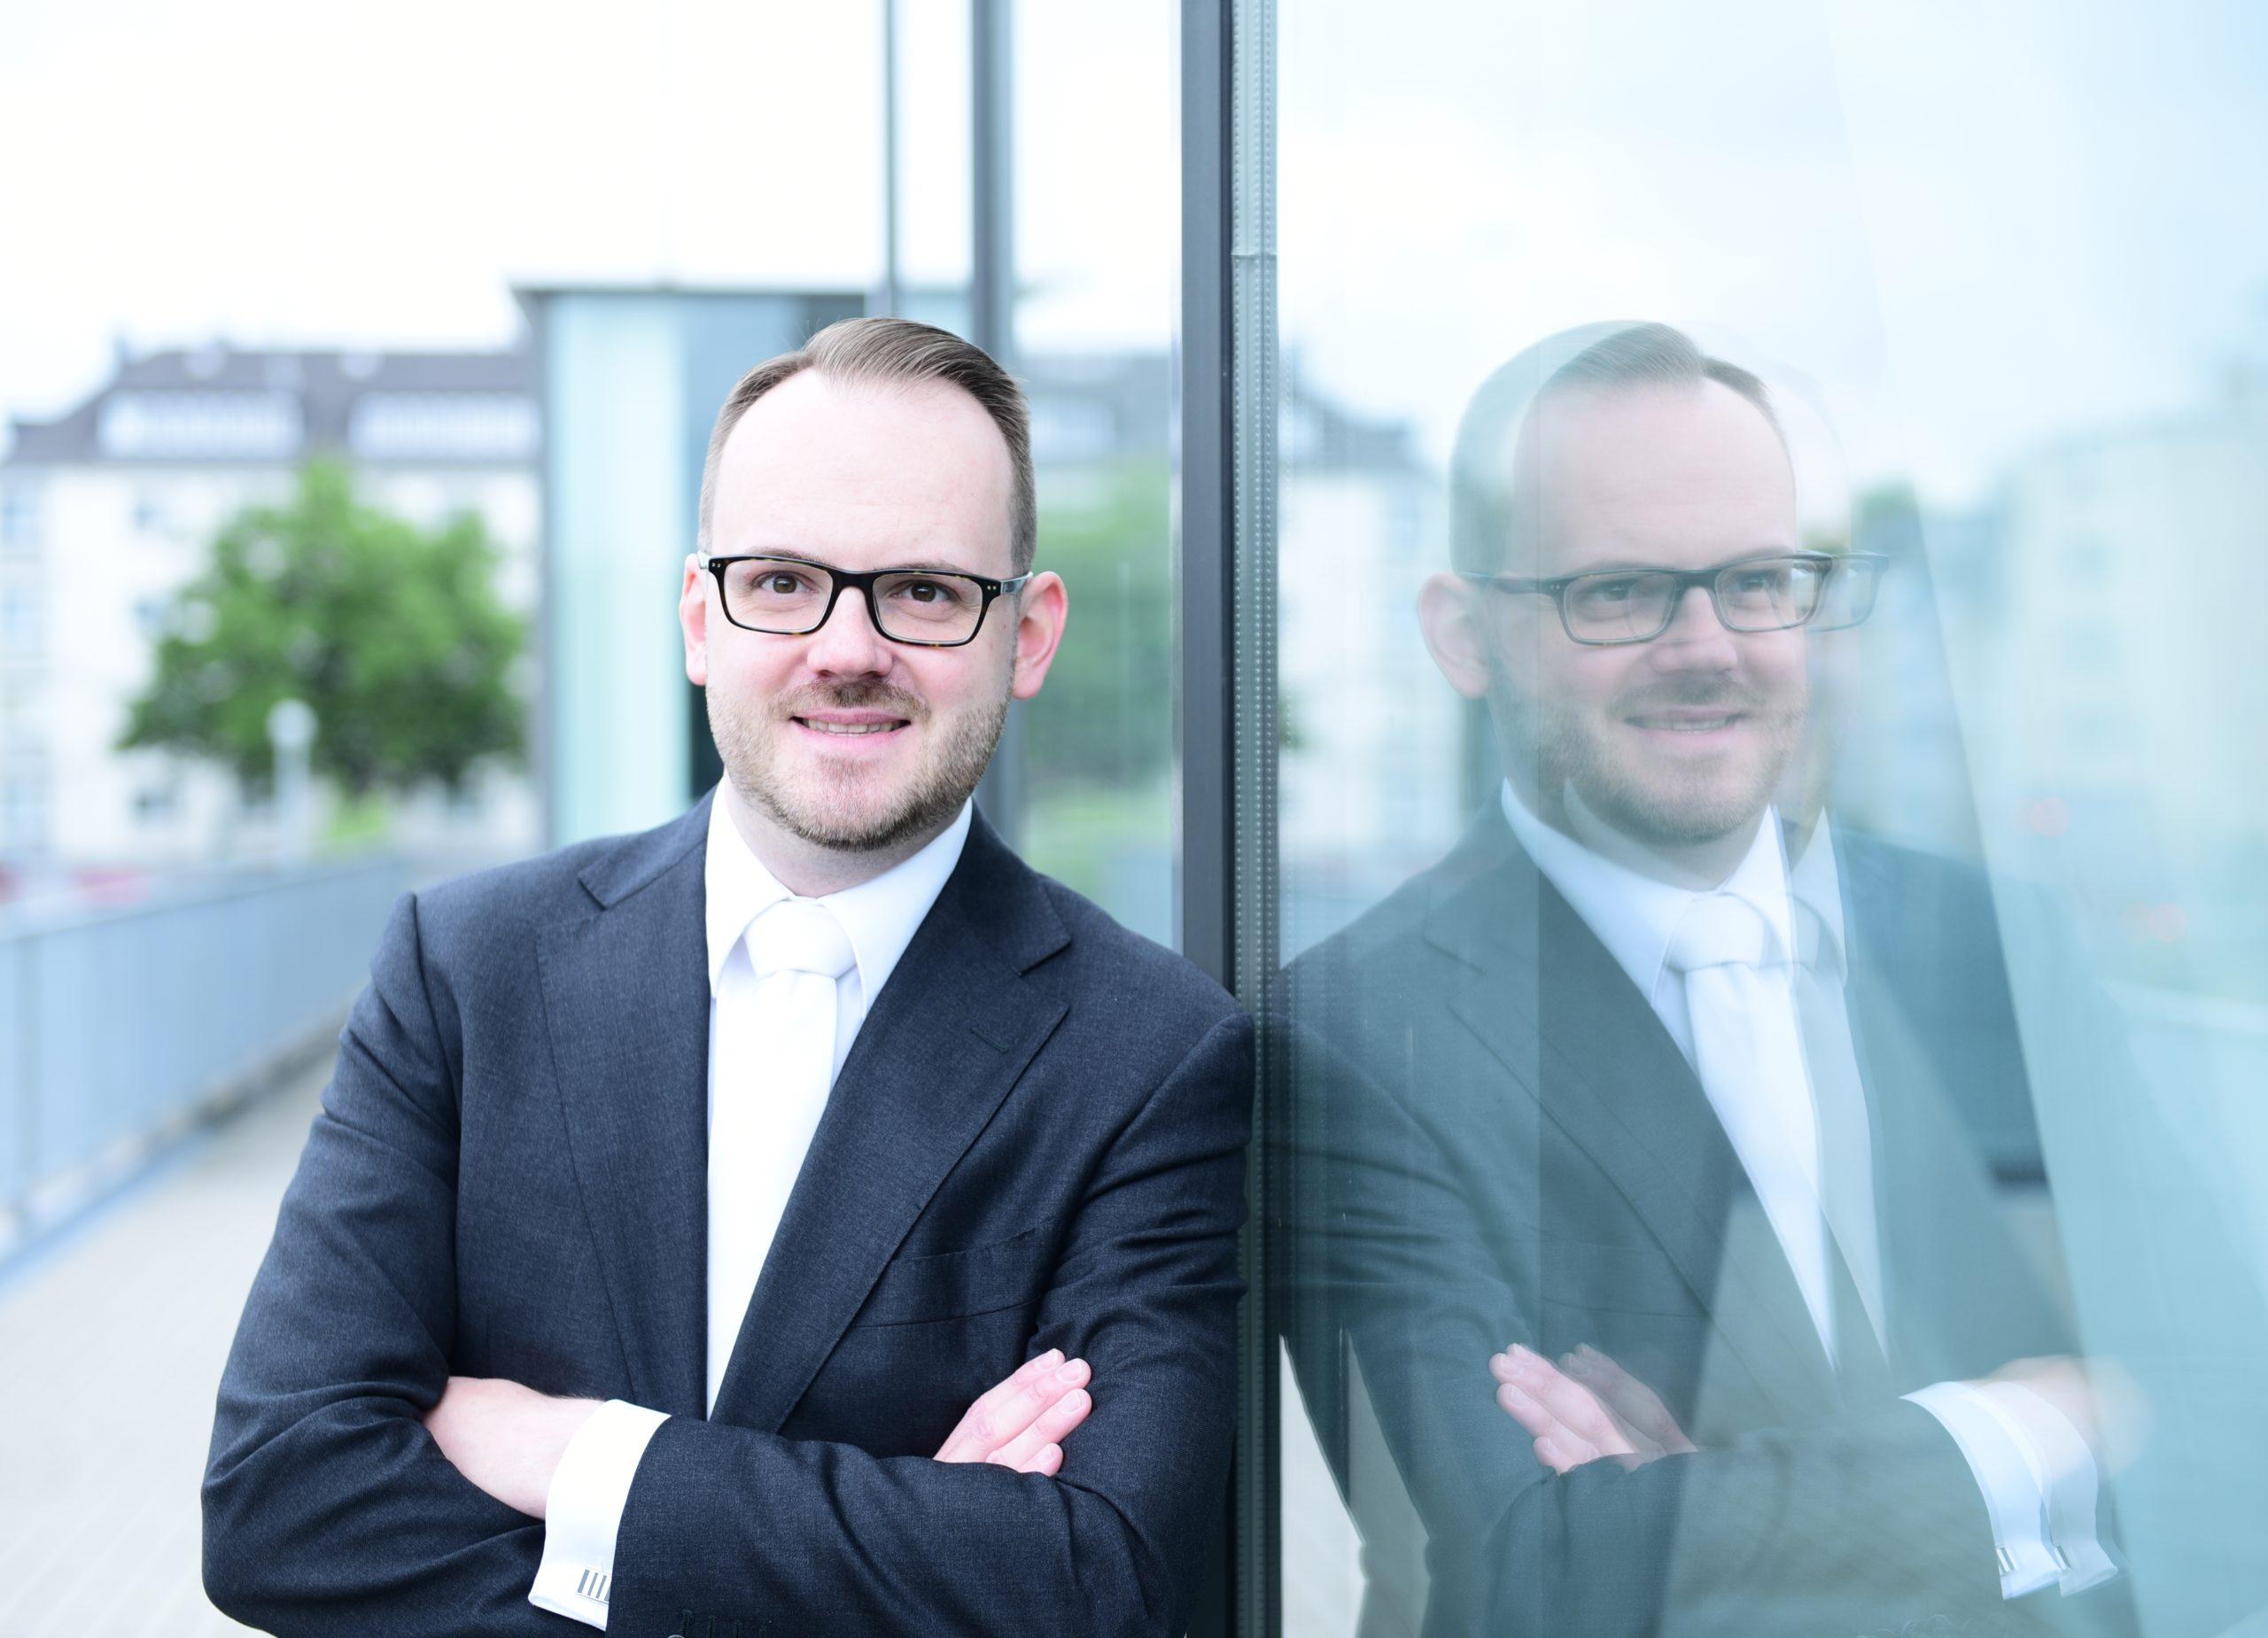 Rechtsanwalt & Strafverteidiger Herbert Botterbrod